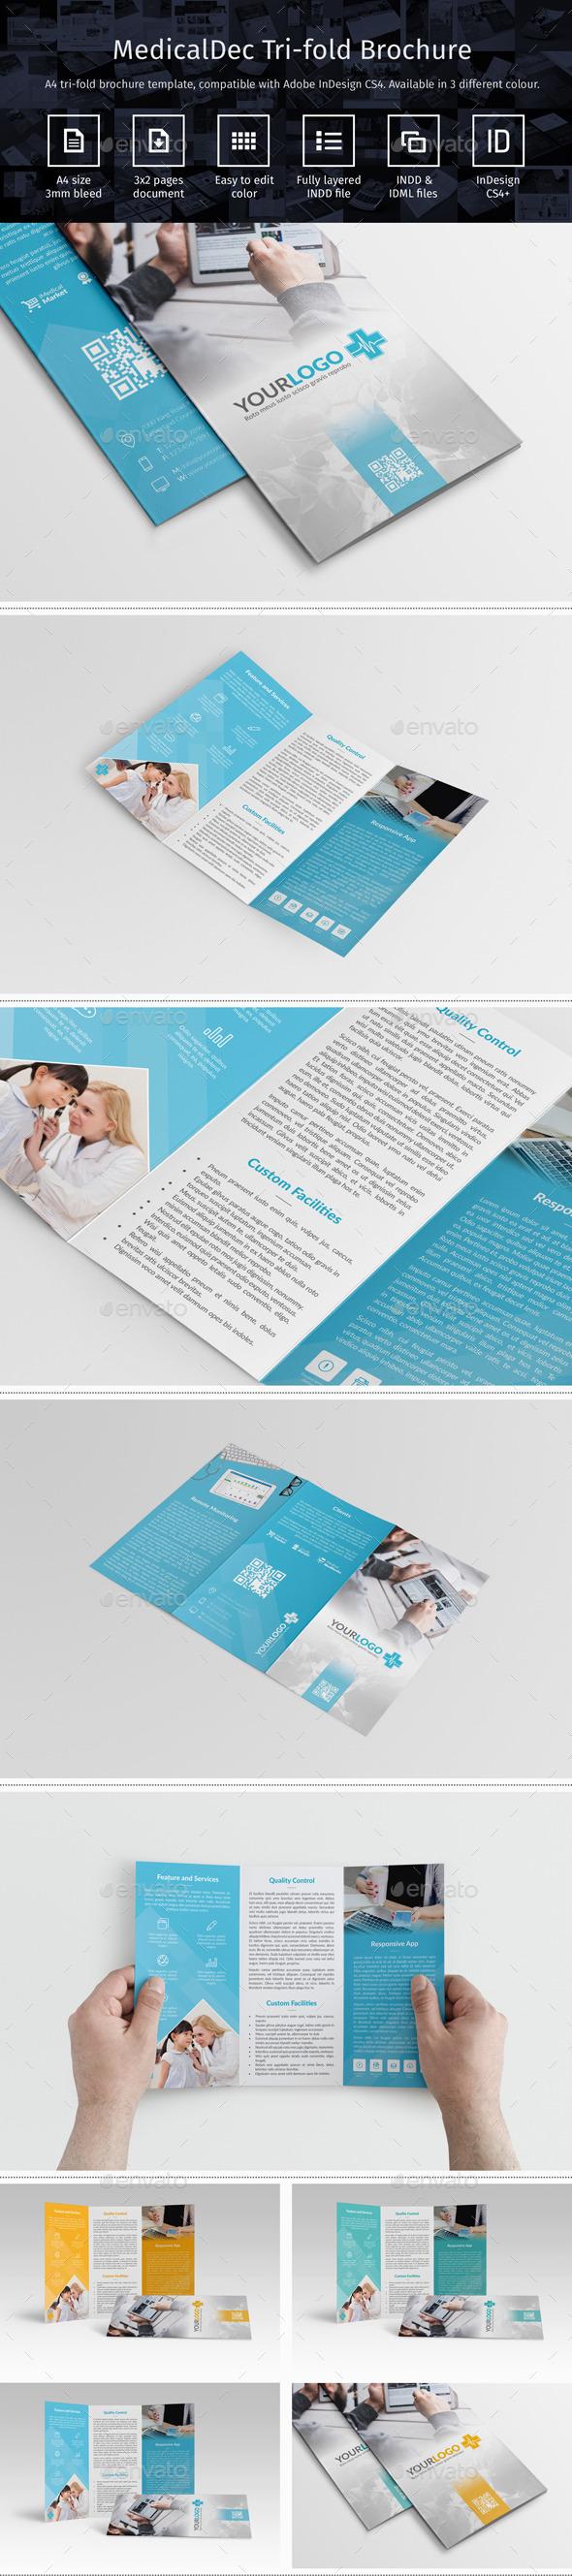 Medicaldec Trifold Brochure  Brochure Template Brochures And